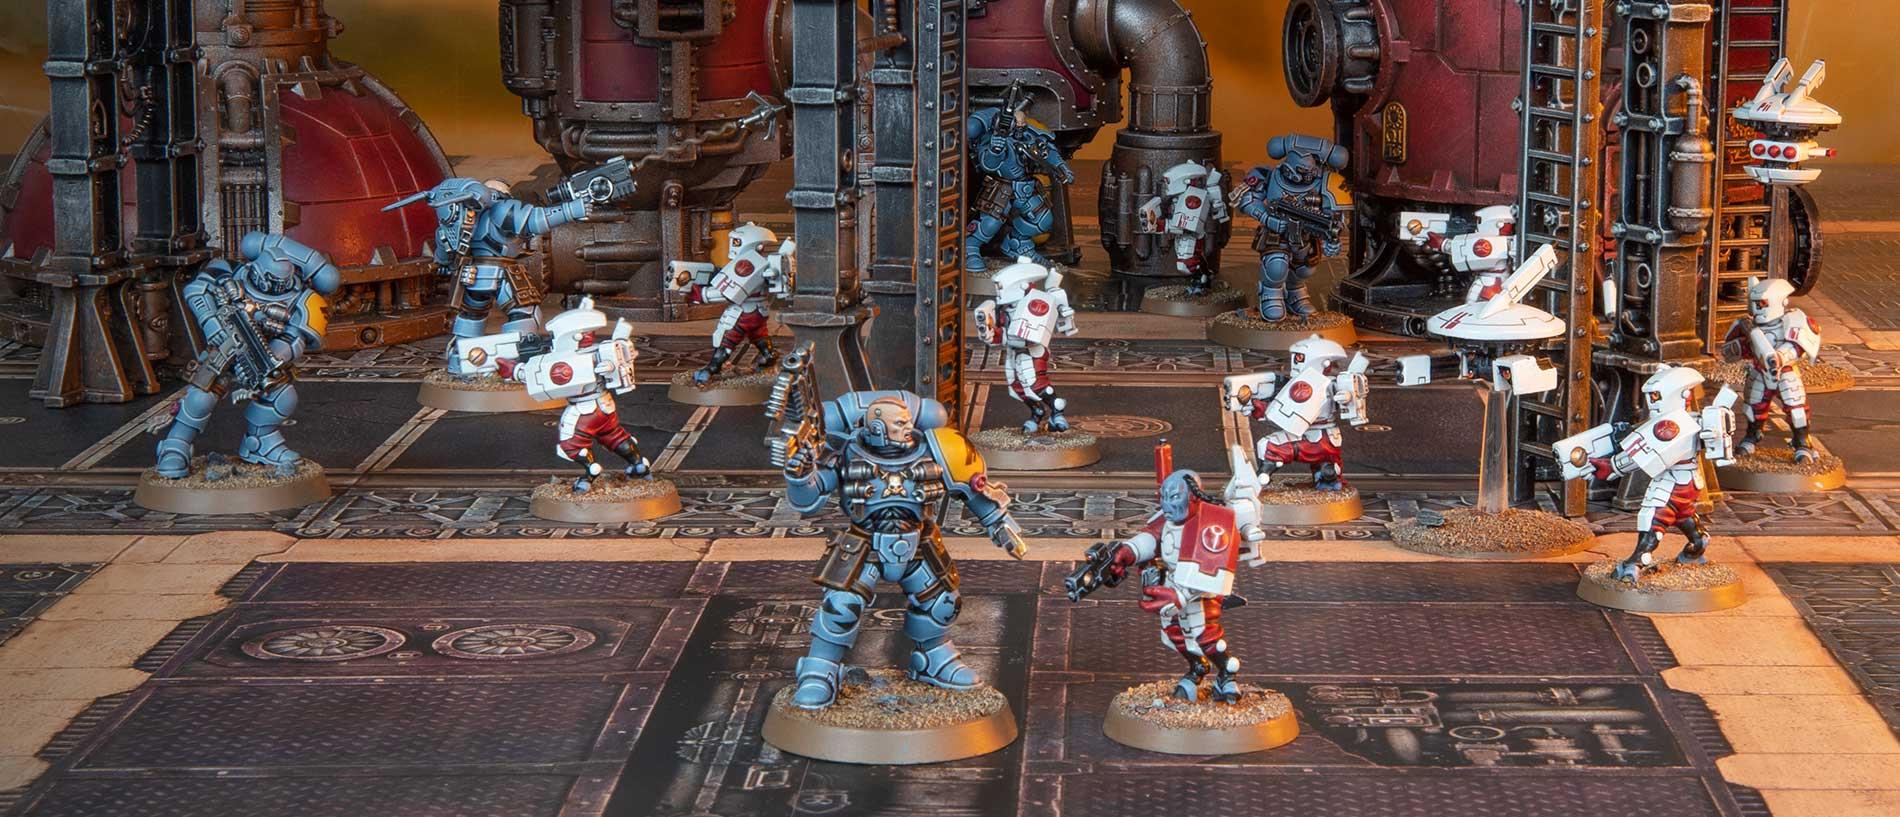 Warhammer 40,000 | Games Workshop Webstore